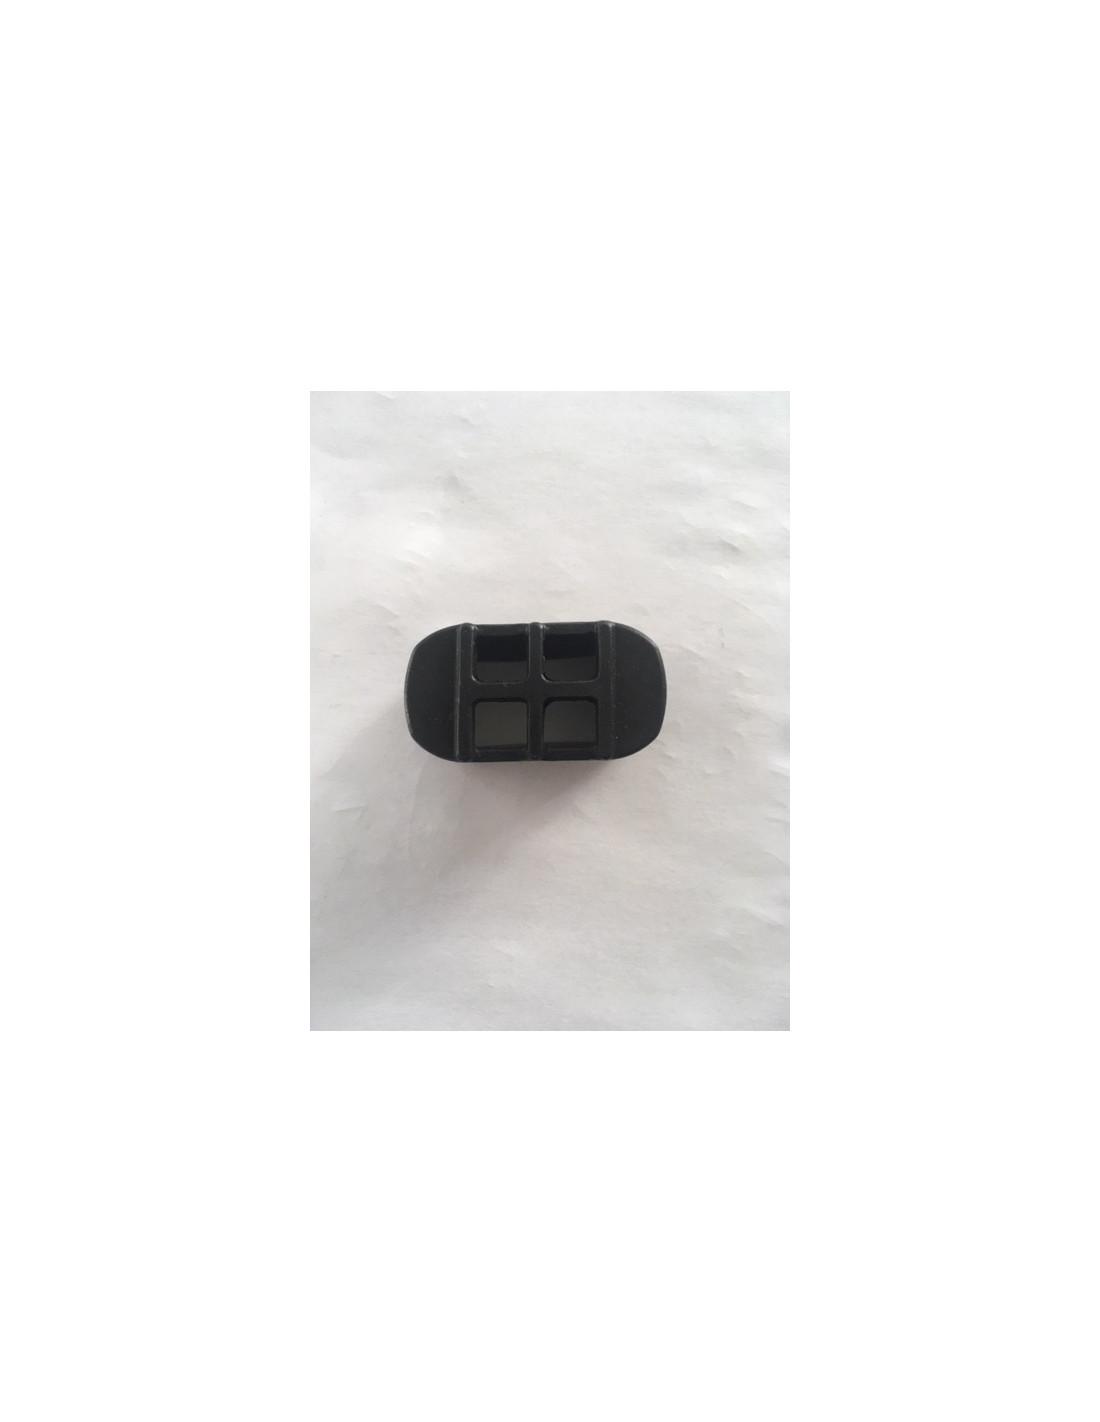 6 - Protection lampe UVC Bitron C 24/36/55 W Oase